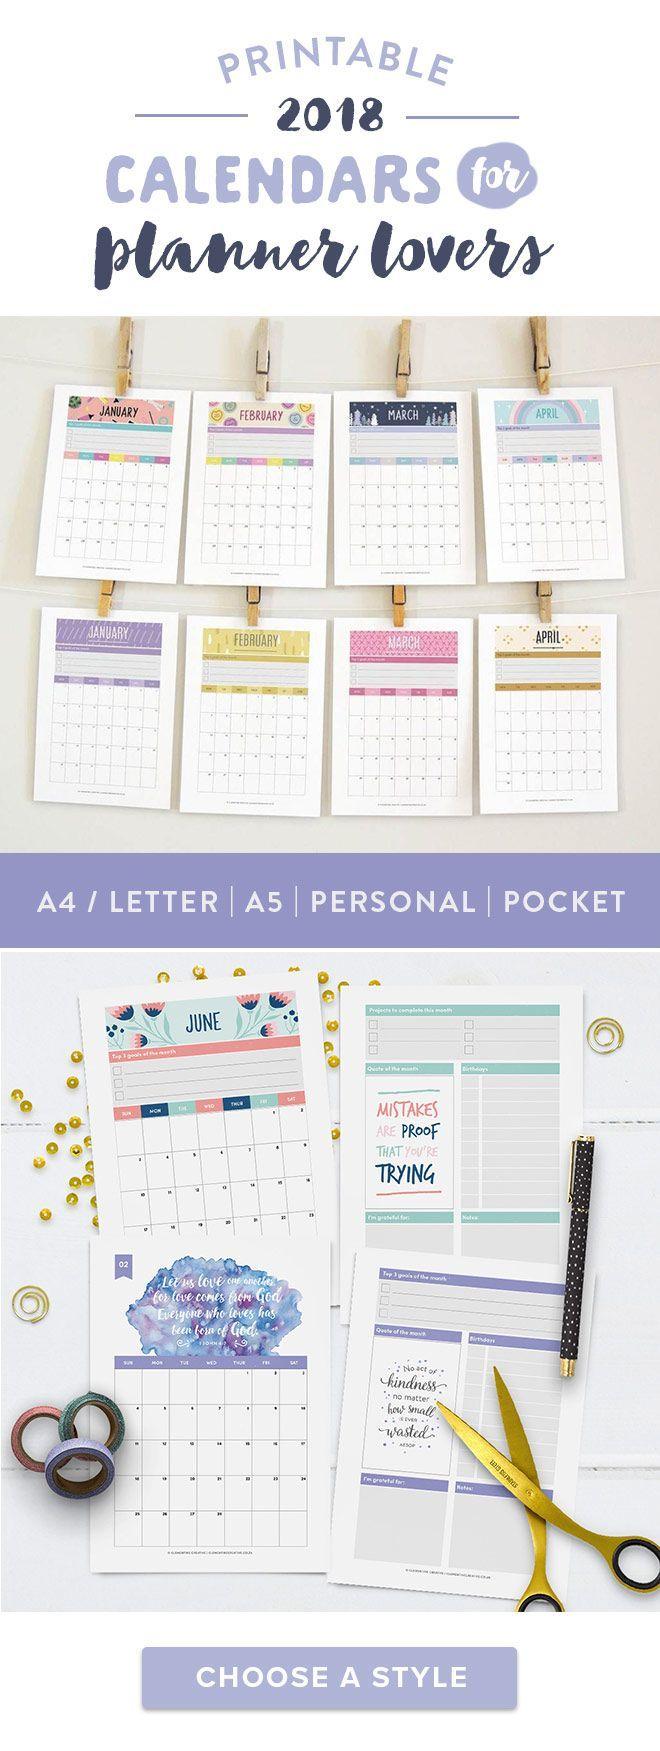 Calendar Notebook Design : Printable calendars binder sizes calendar design